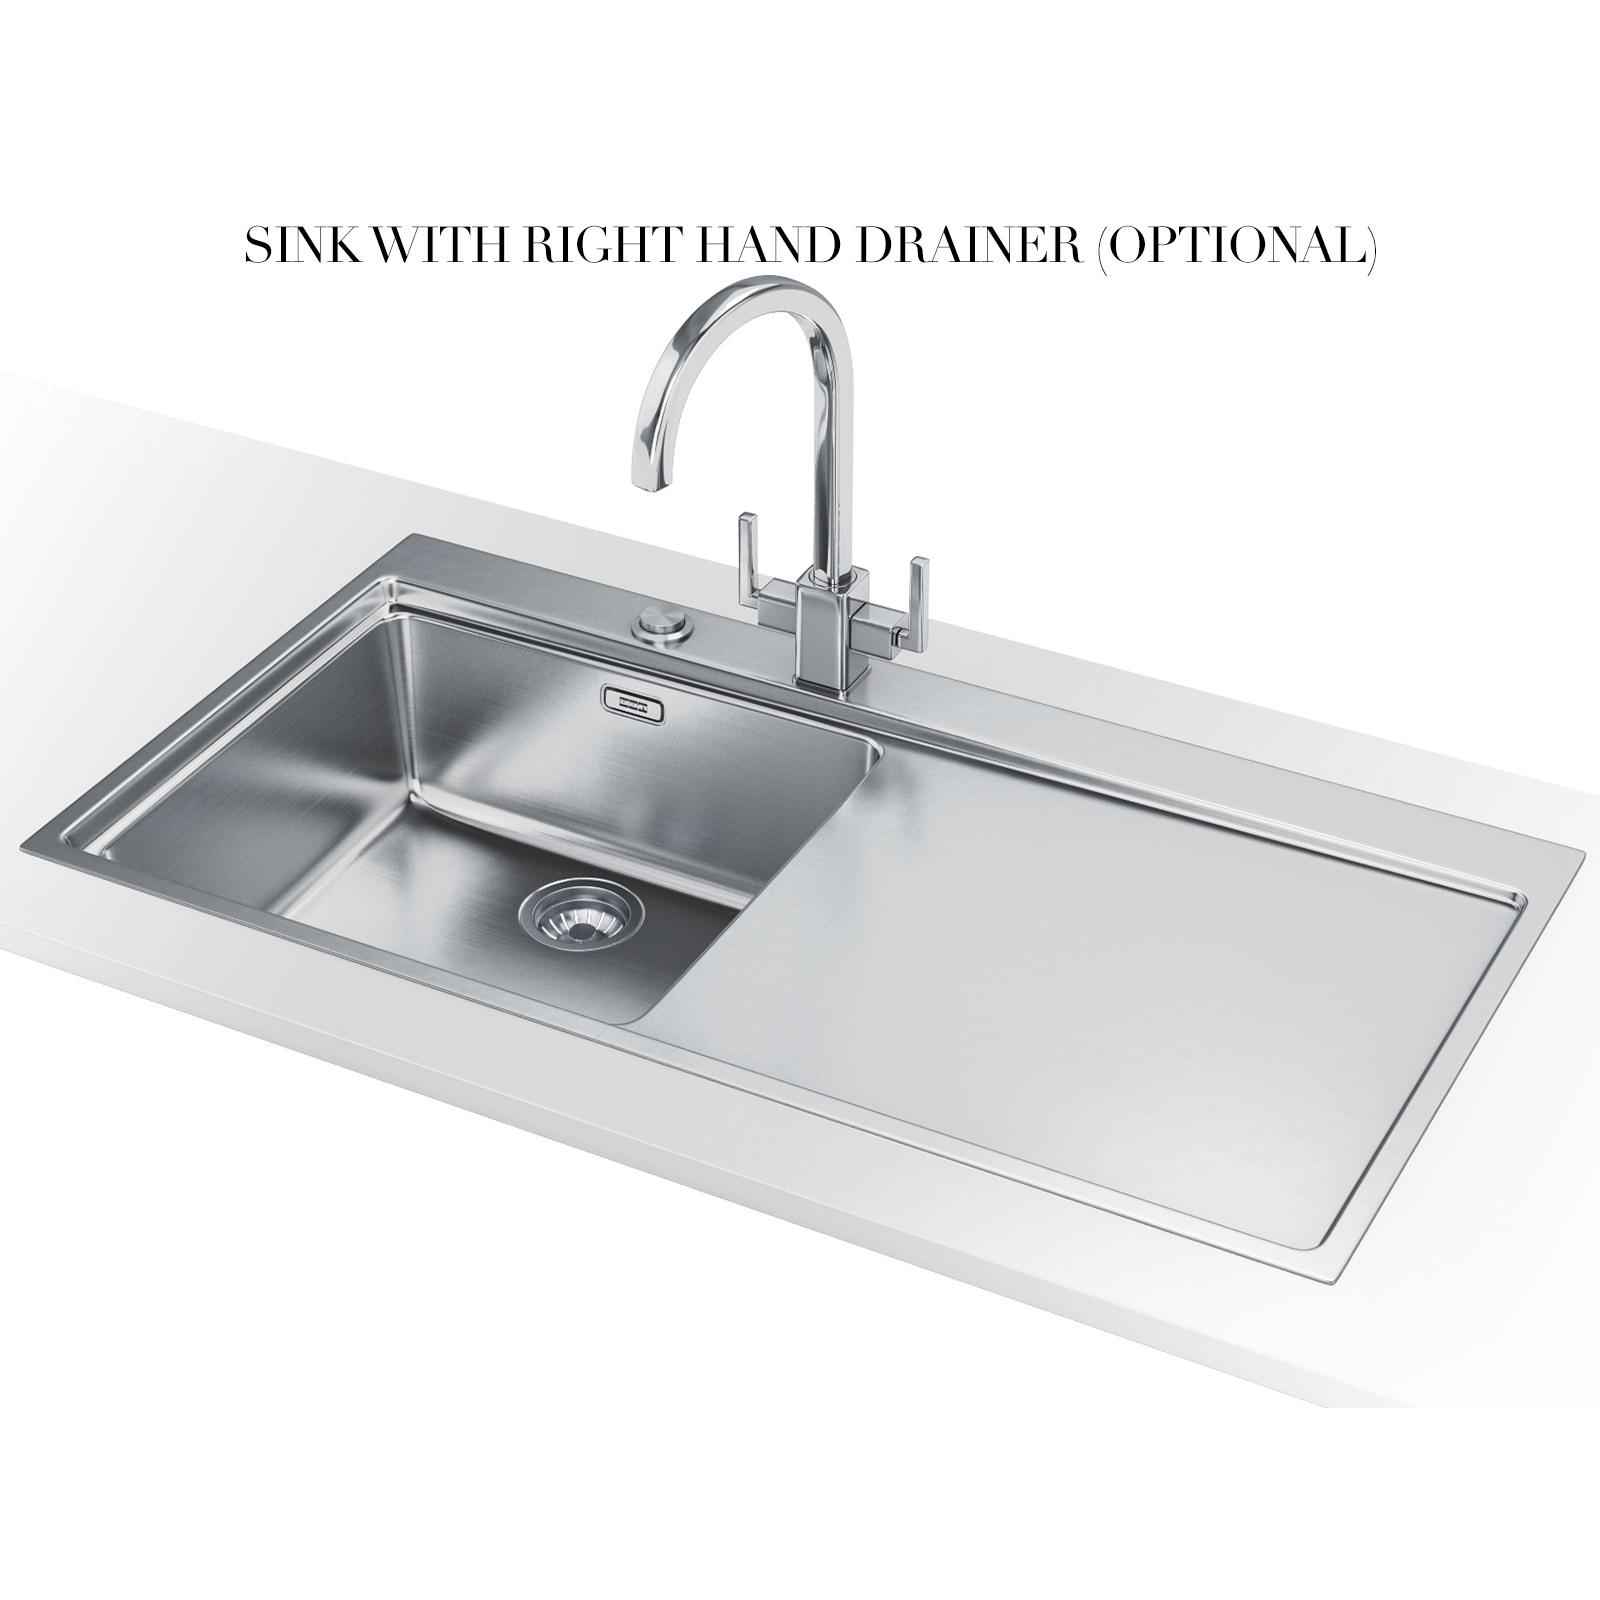 Franke Mythos Sink Stainless Steel : ... of Franke Mythos MMX 211 Slim-Top 1.0 Bowl Stainless Steel Inset Sink